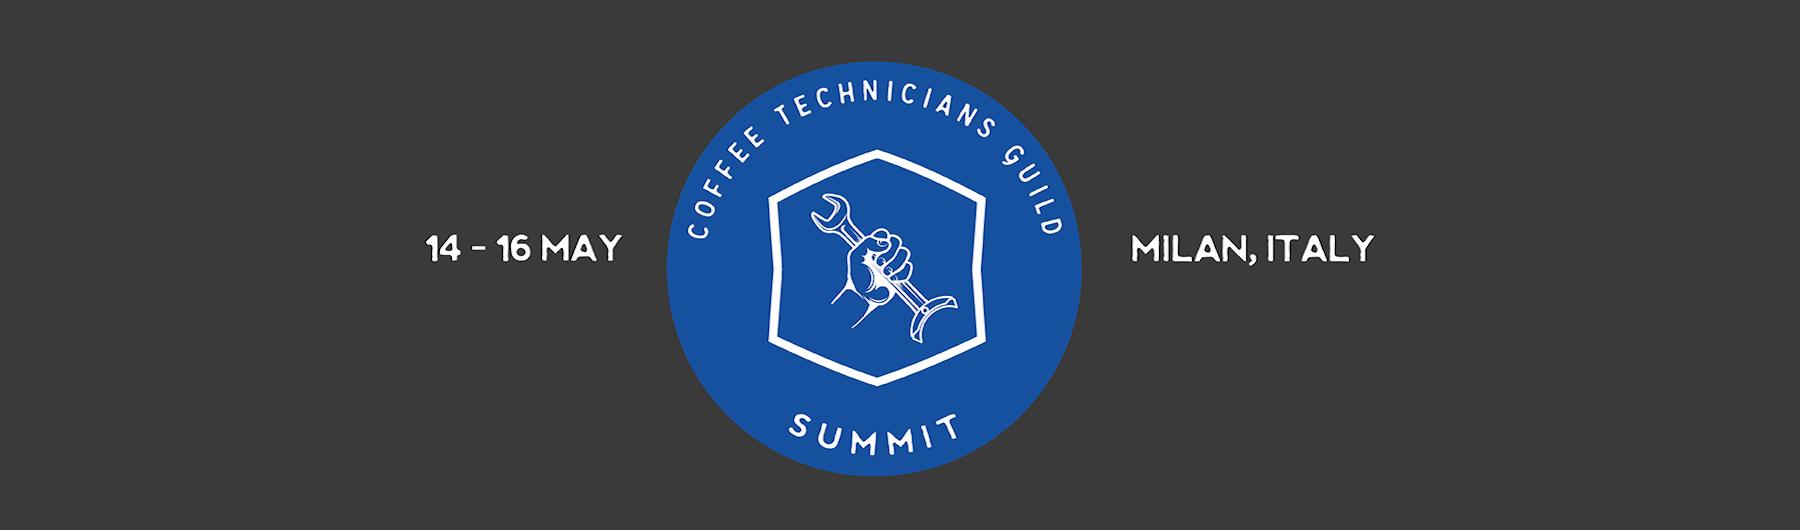 Coffee Technicians Guild 2019